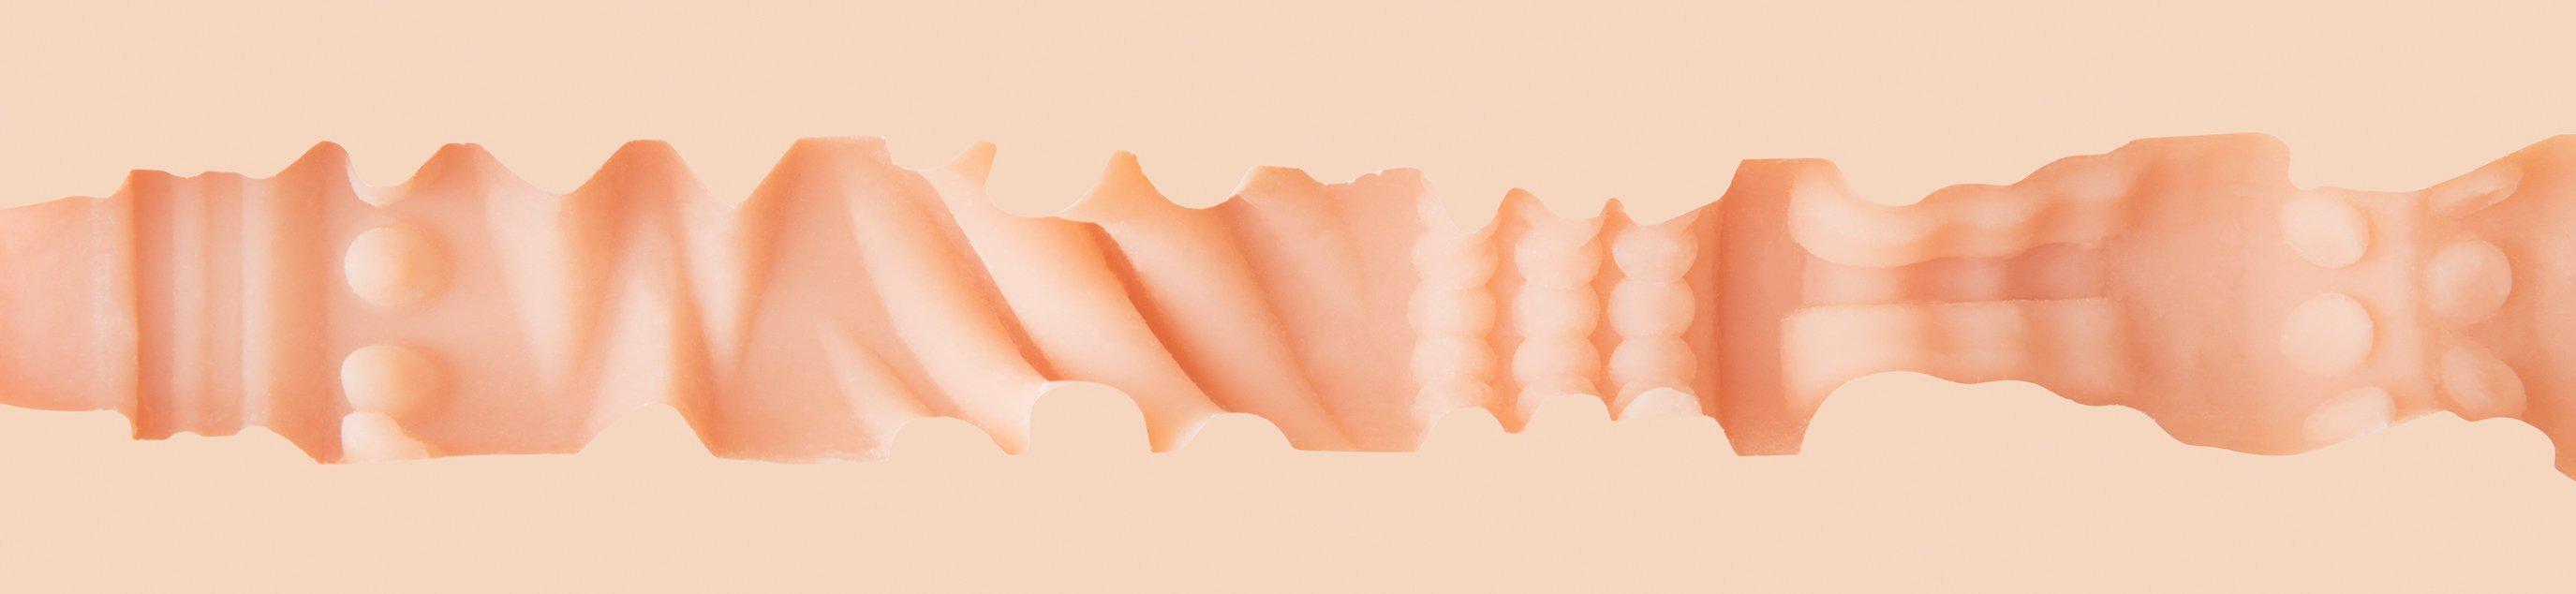 Lush Texture Image